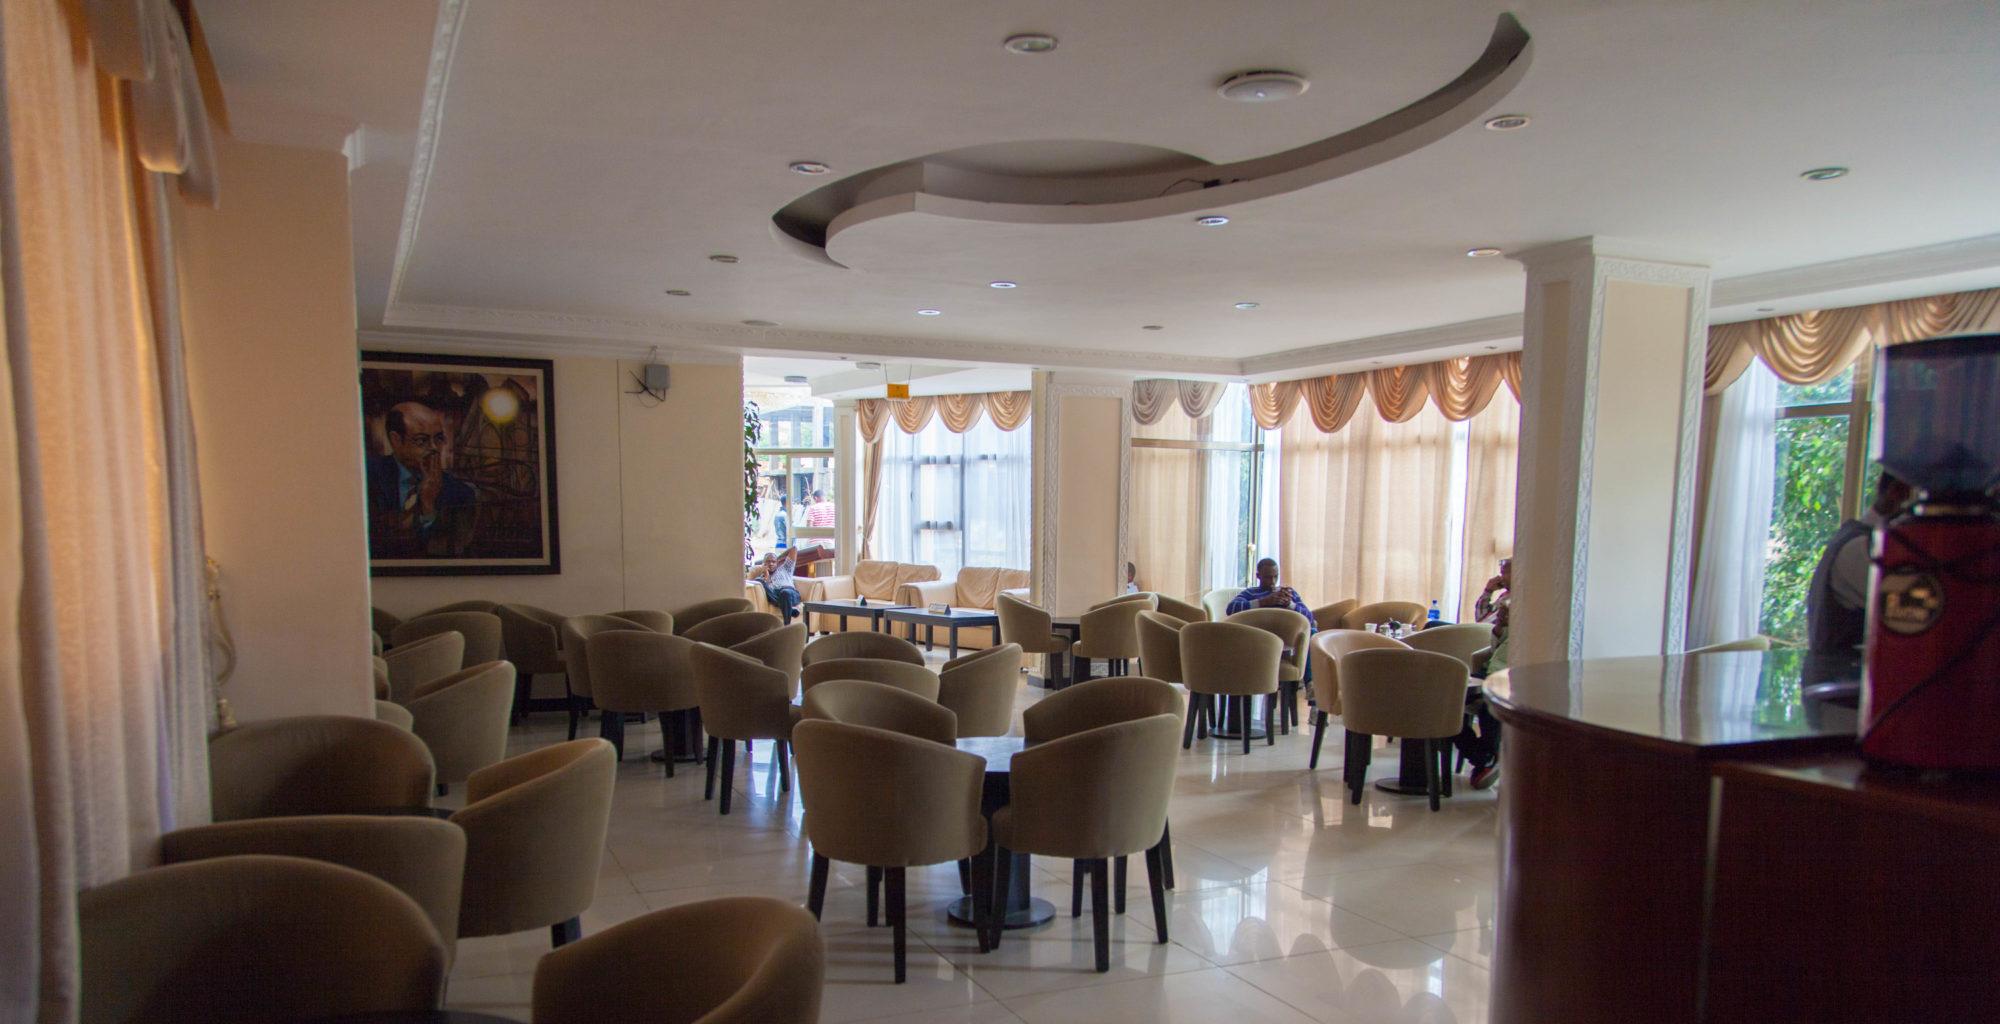 Sabean International Hotel Ethiopia Restaurant